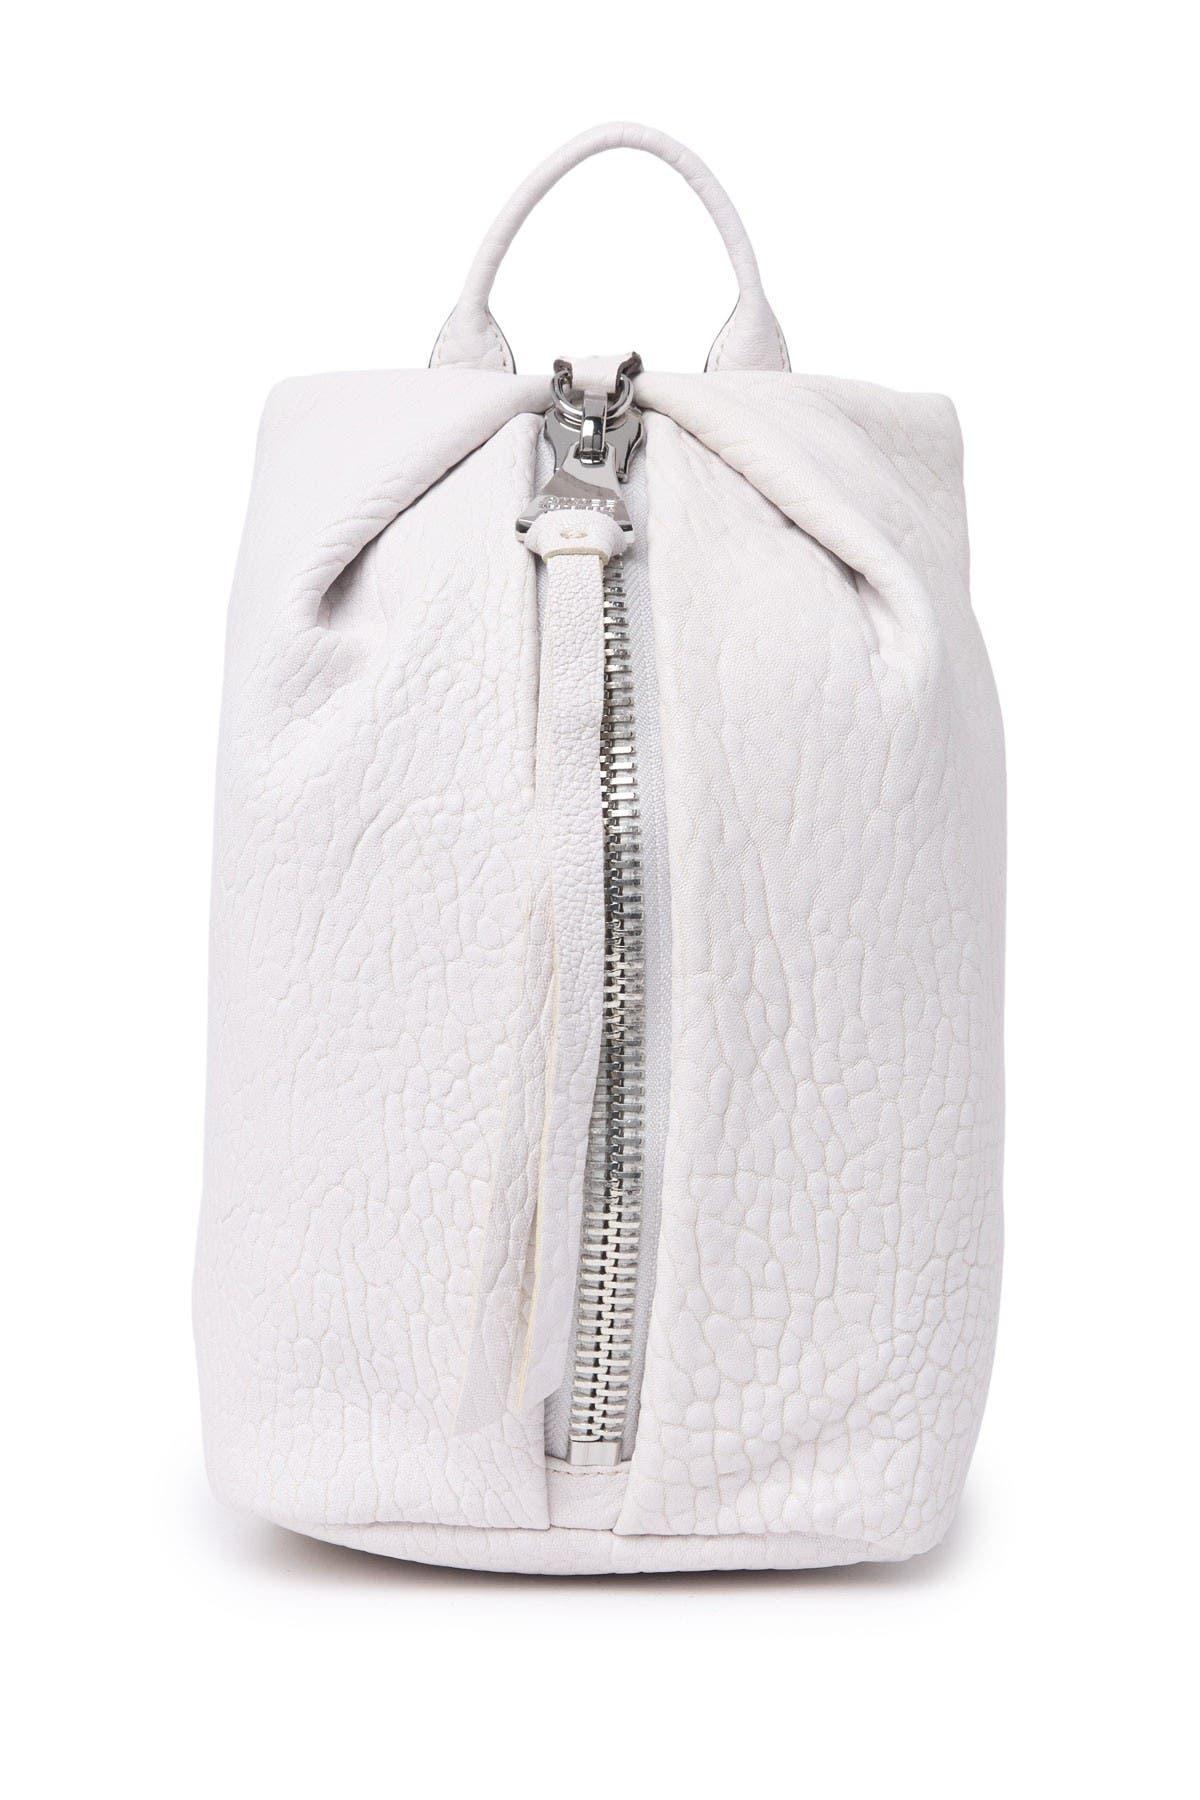 Image of Aimee Kestenberg Tamitha Mini Leather Backpack